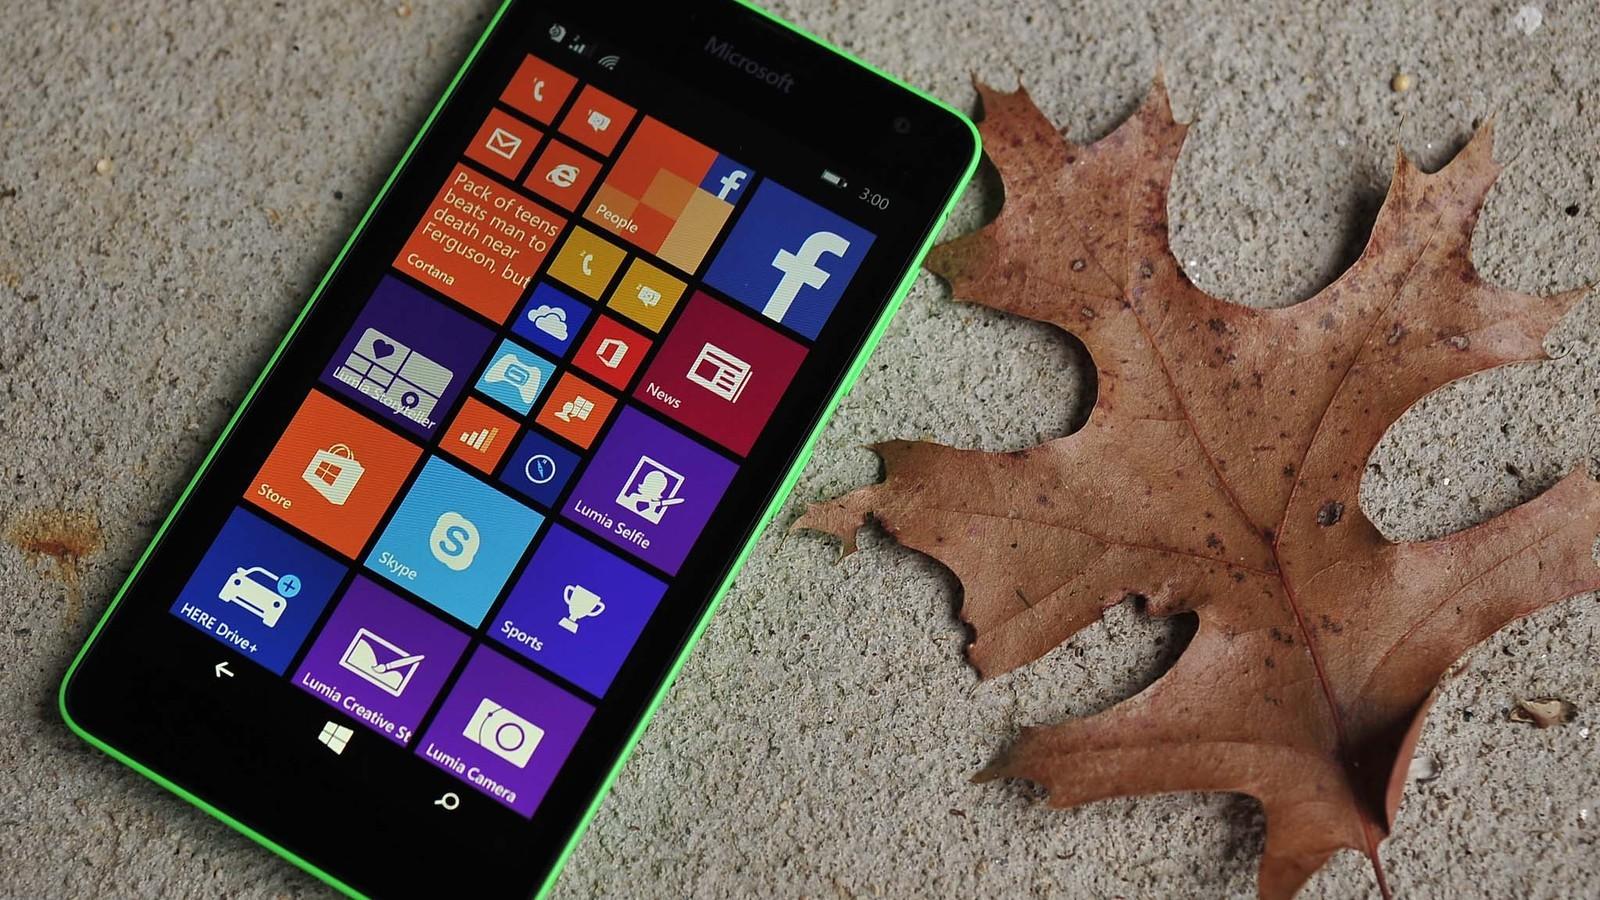 ban sua loi lumia 535 - Microsoft xác nhận tung ra bản sửa lỗi cảm ứng cho Lumia 535